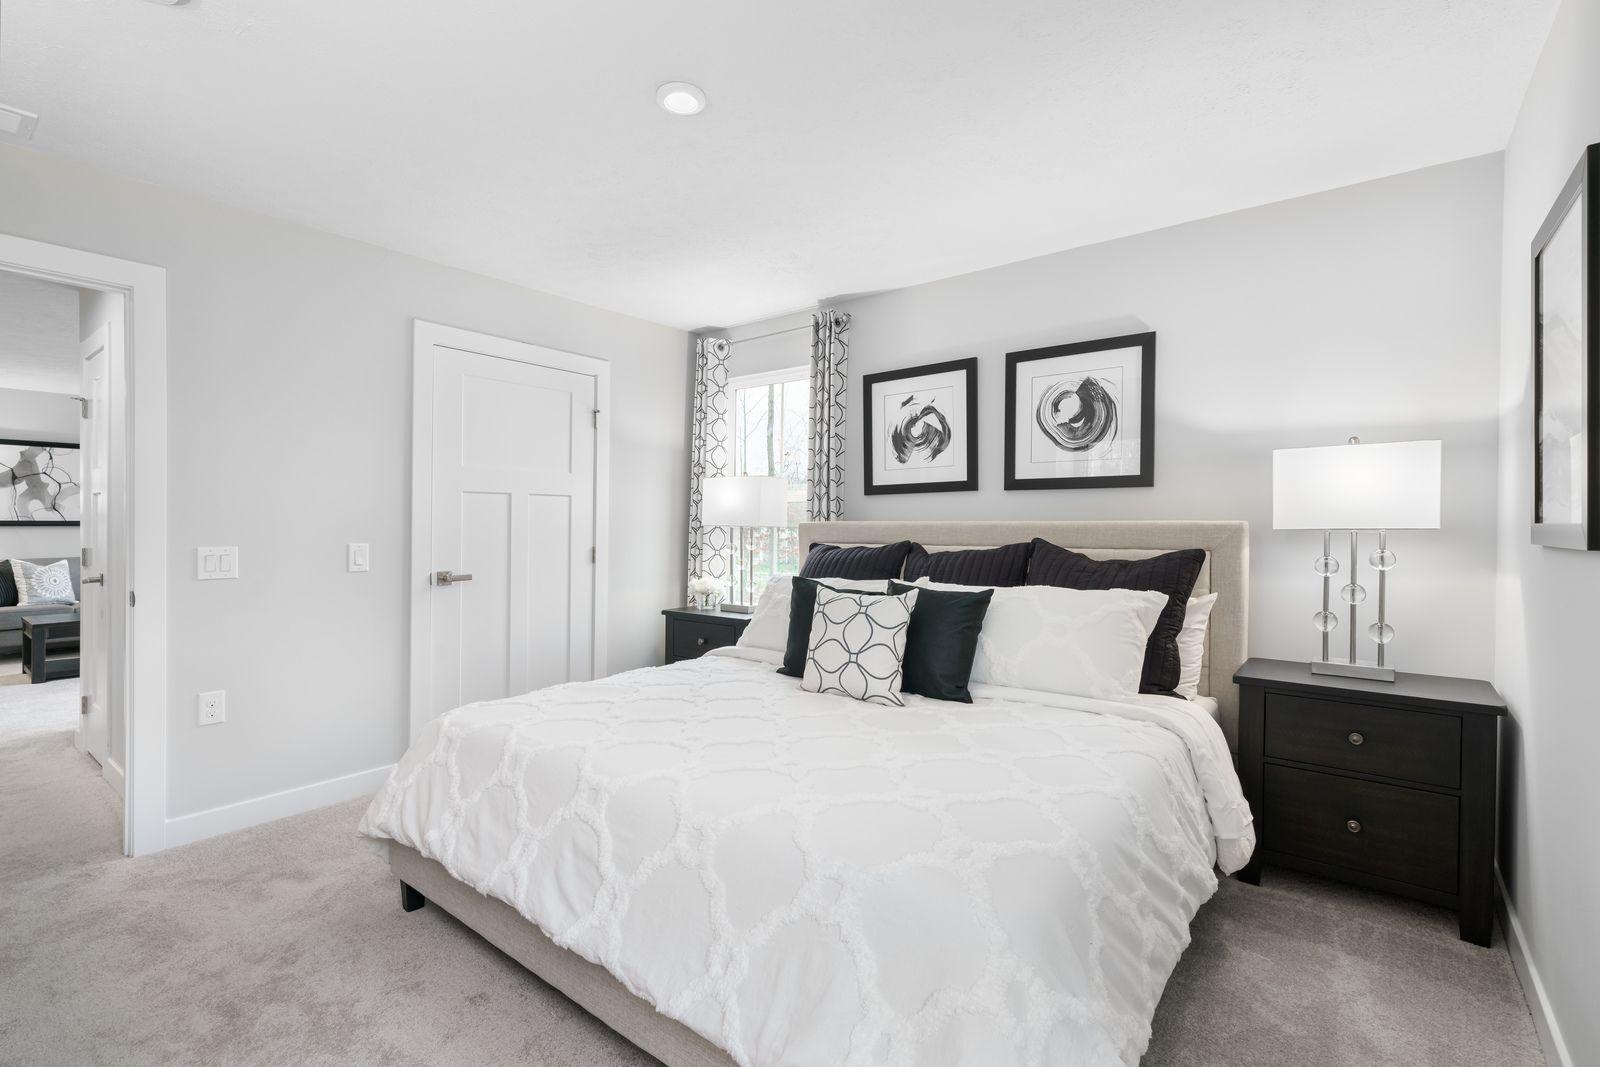 Bedroom featured in the Aruba Bay By Ryan Homes in Norfolk-Newport News, VA